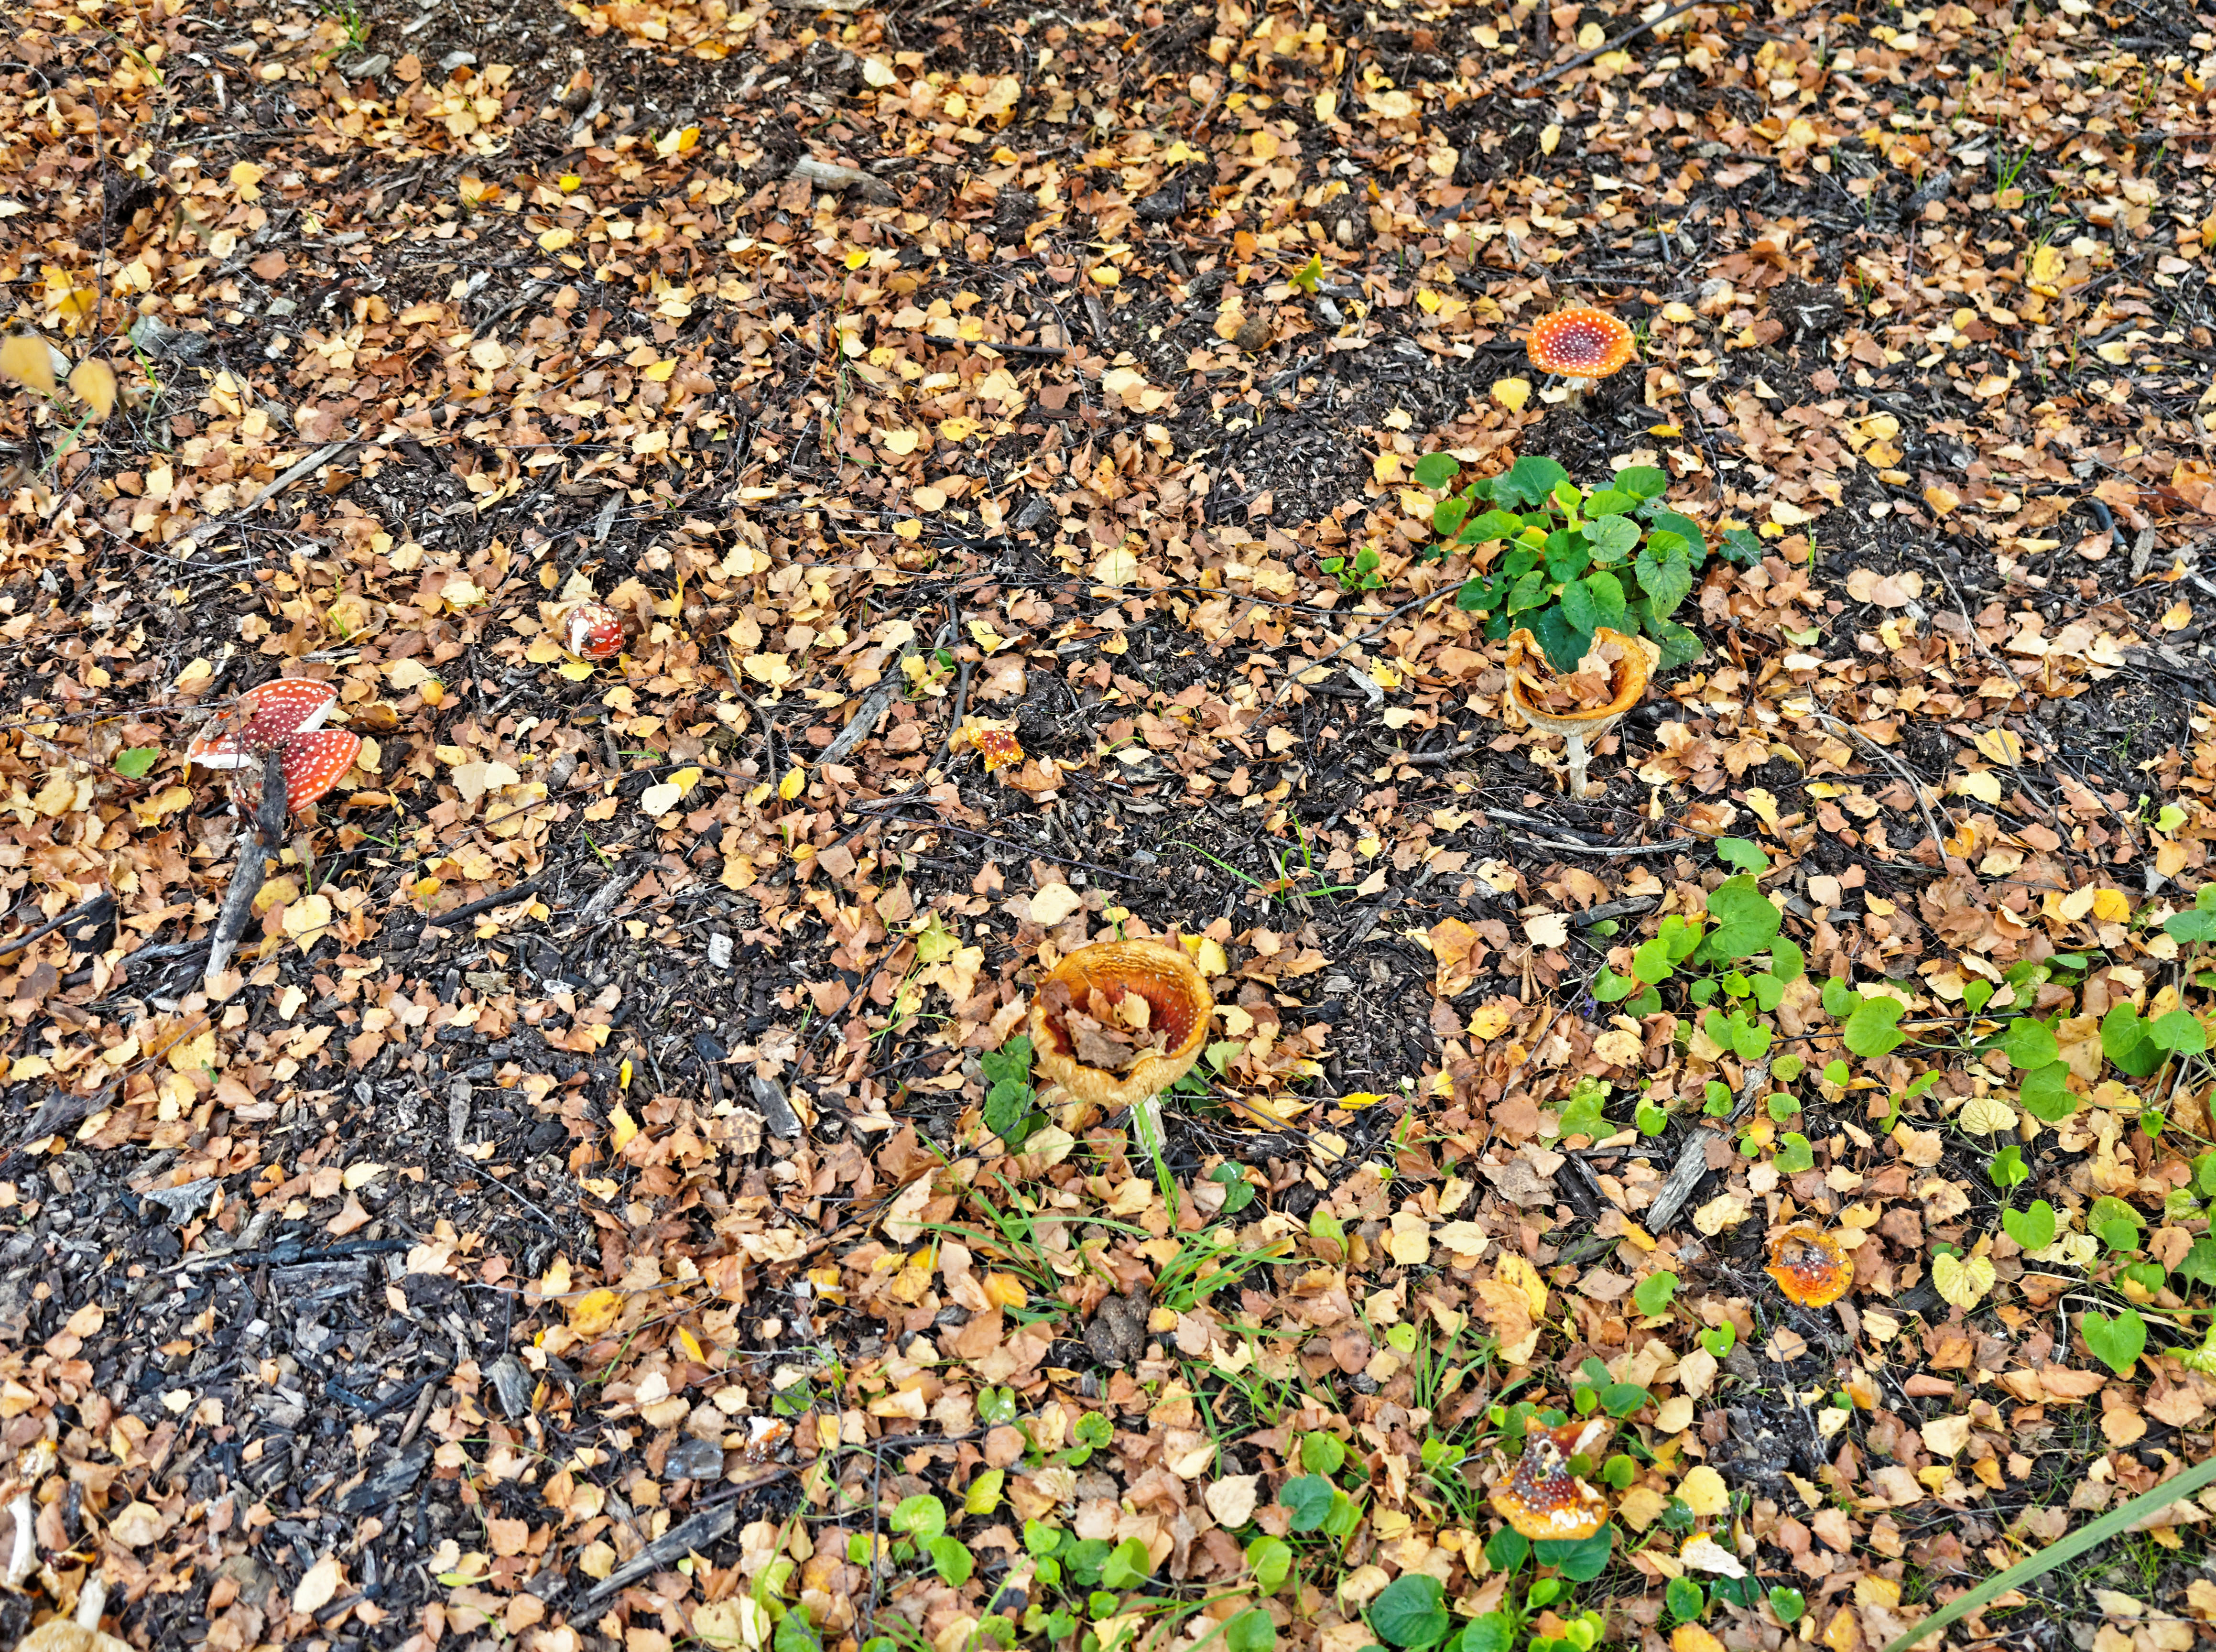 Amanita-muscaria-2.jpeg